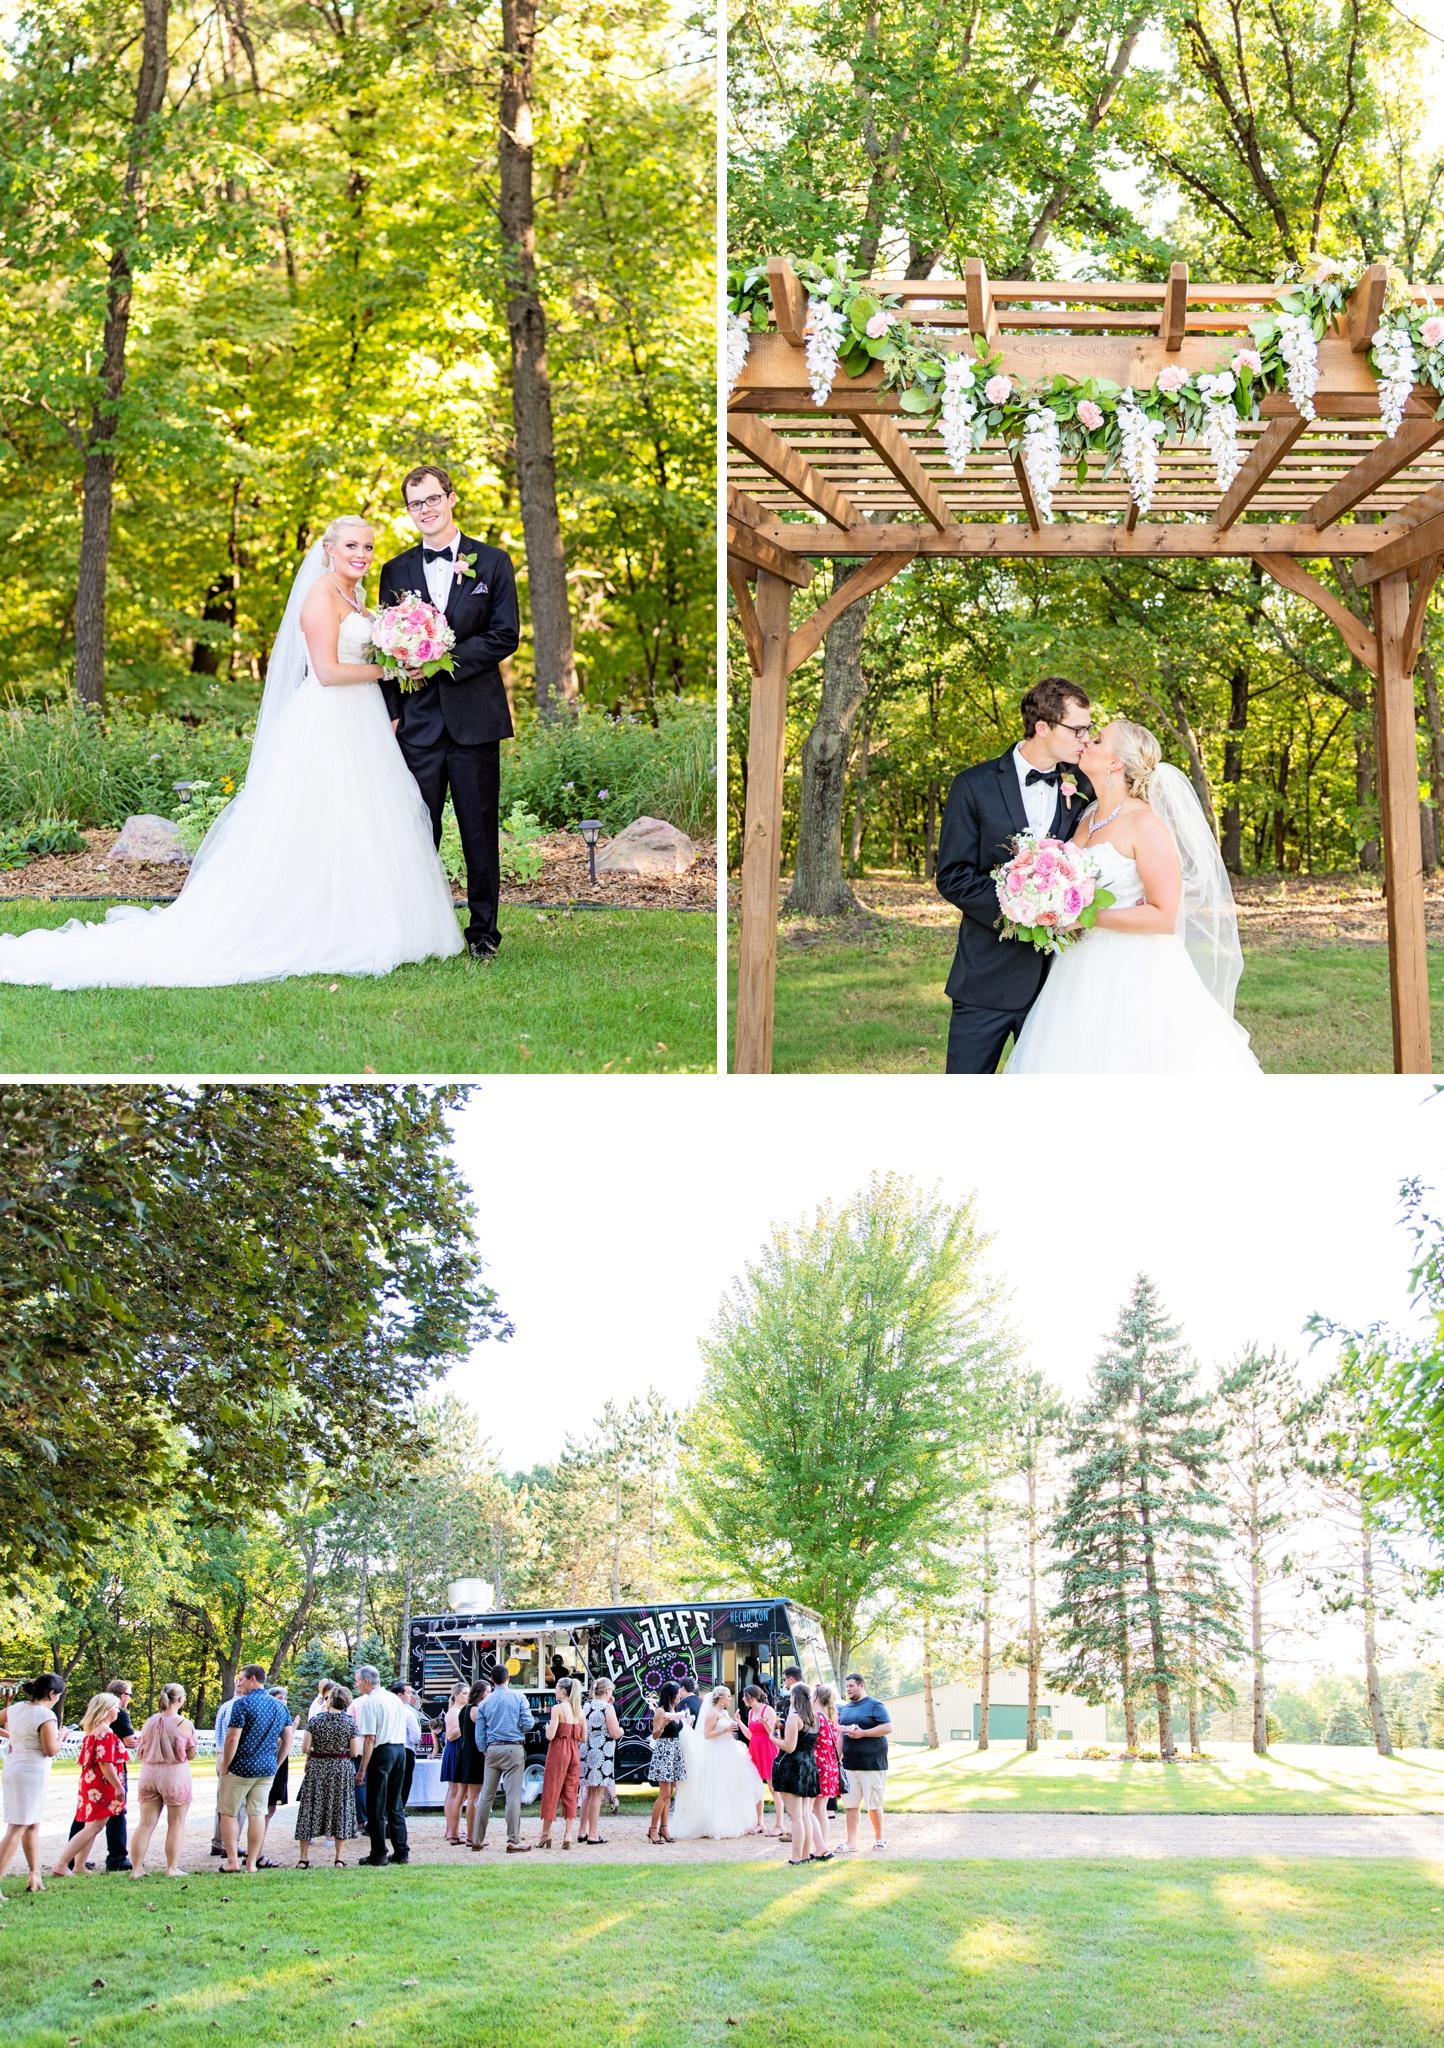 Brittany-Jay-Wedding-091518-Rotella-Photography-22_BLOG.jpg